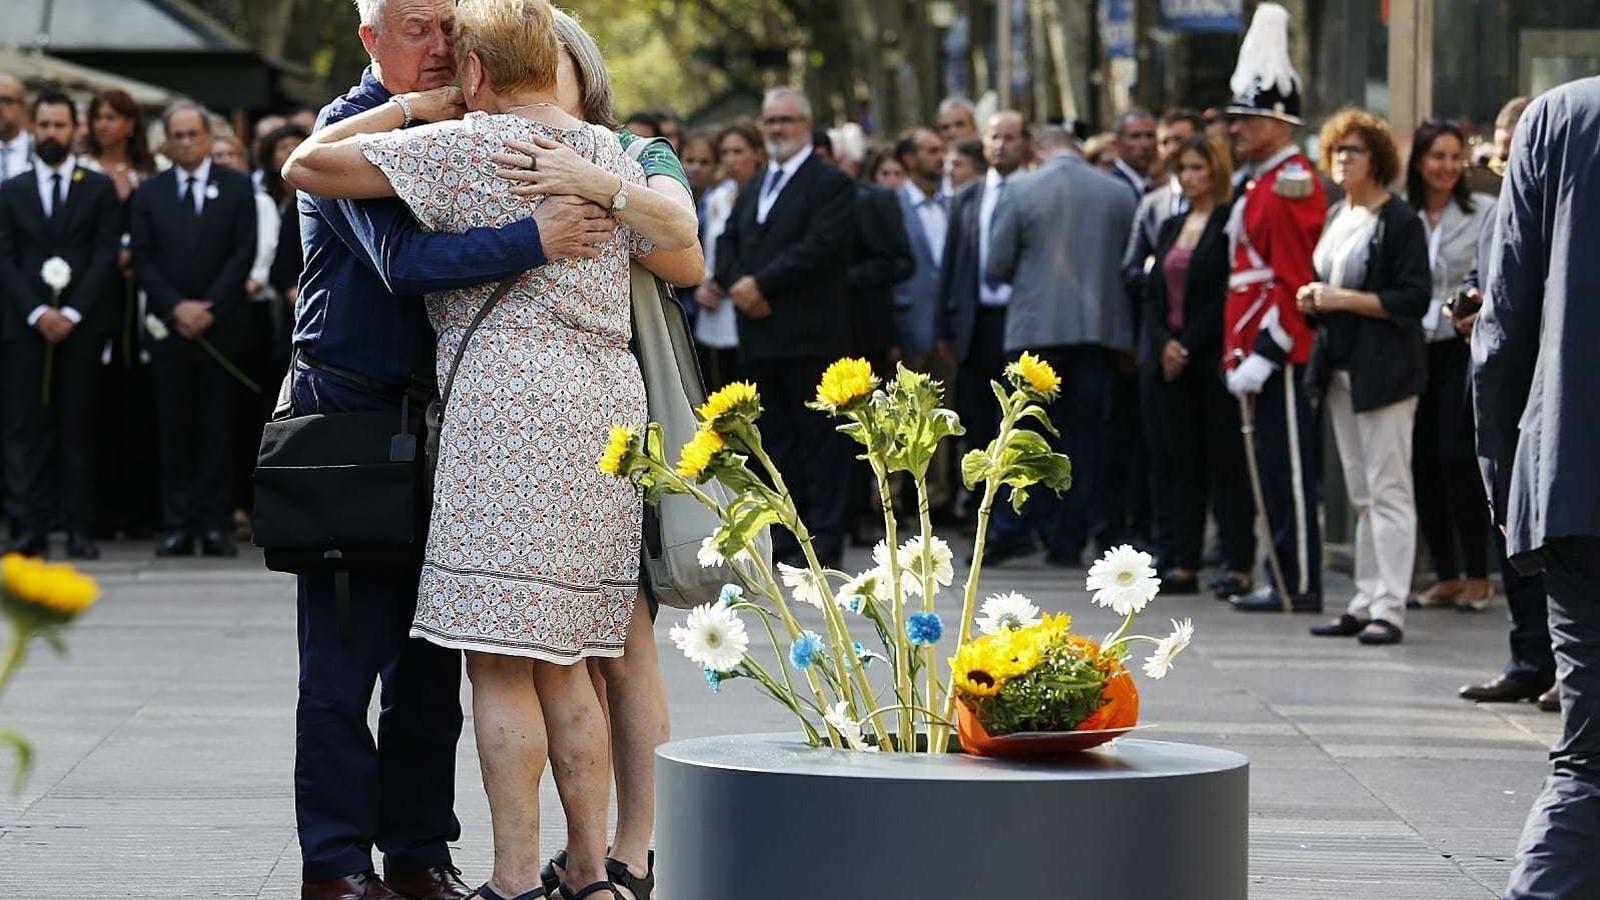 Familiars de les víctimes s'abracen davant del mosaic de Miró, després de fer l'ofrena floral